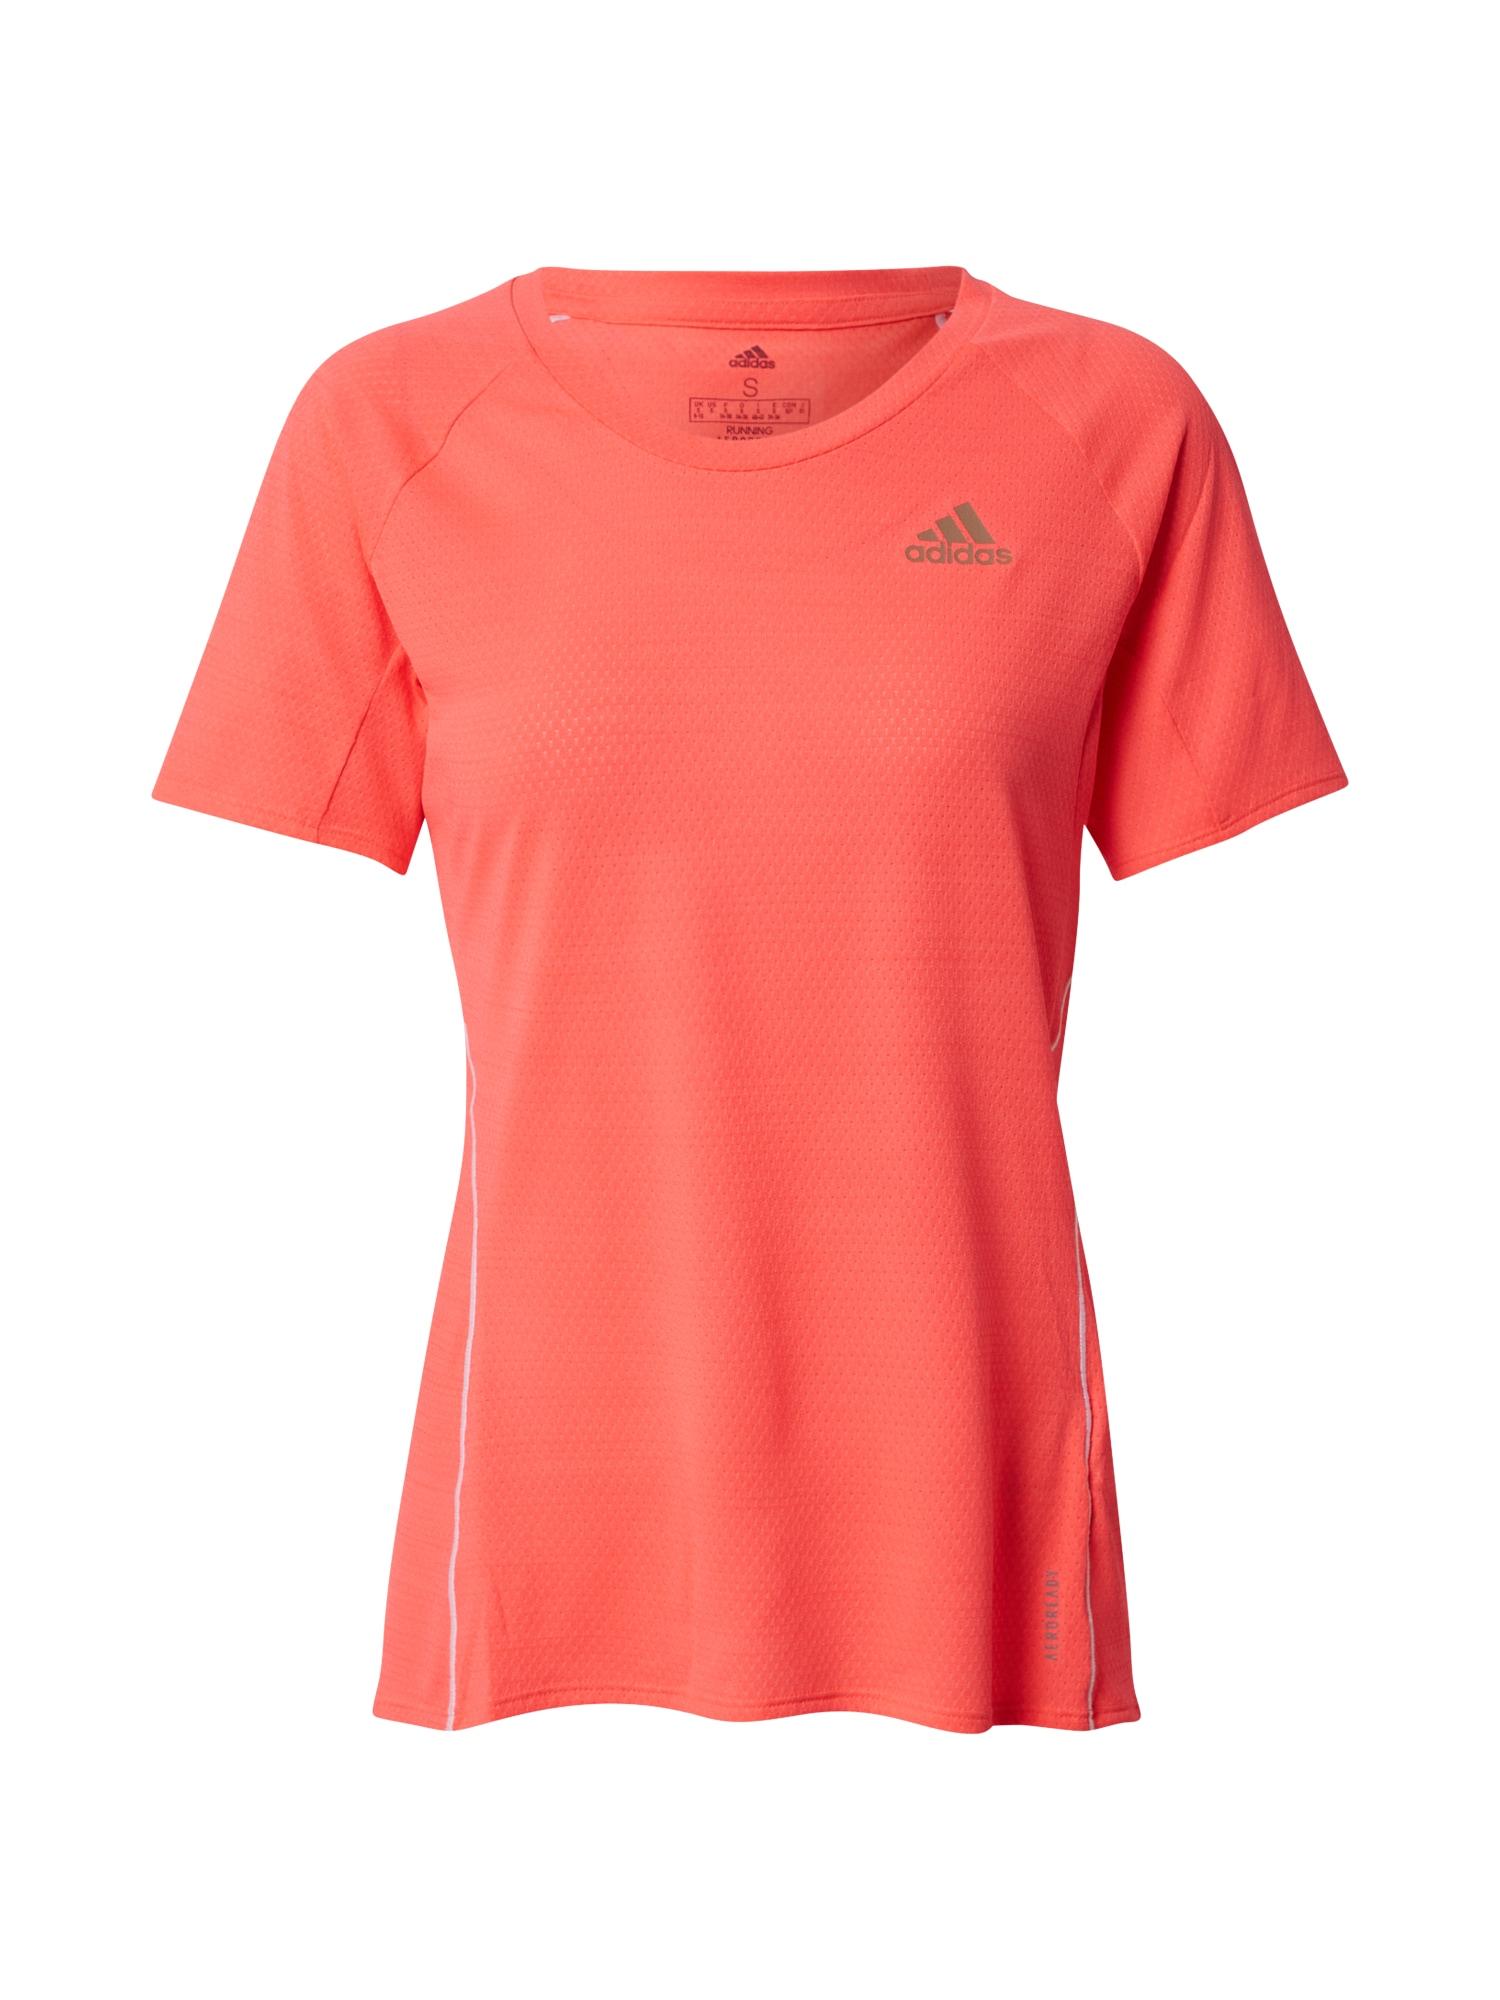 ADIDAS PERFORMANCE Funkční tričko 'Runner'  tmavě růžová